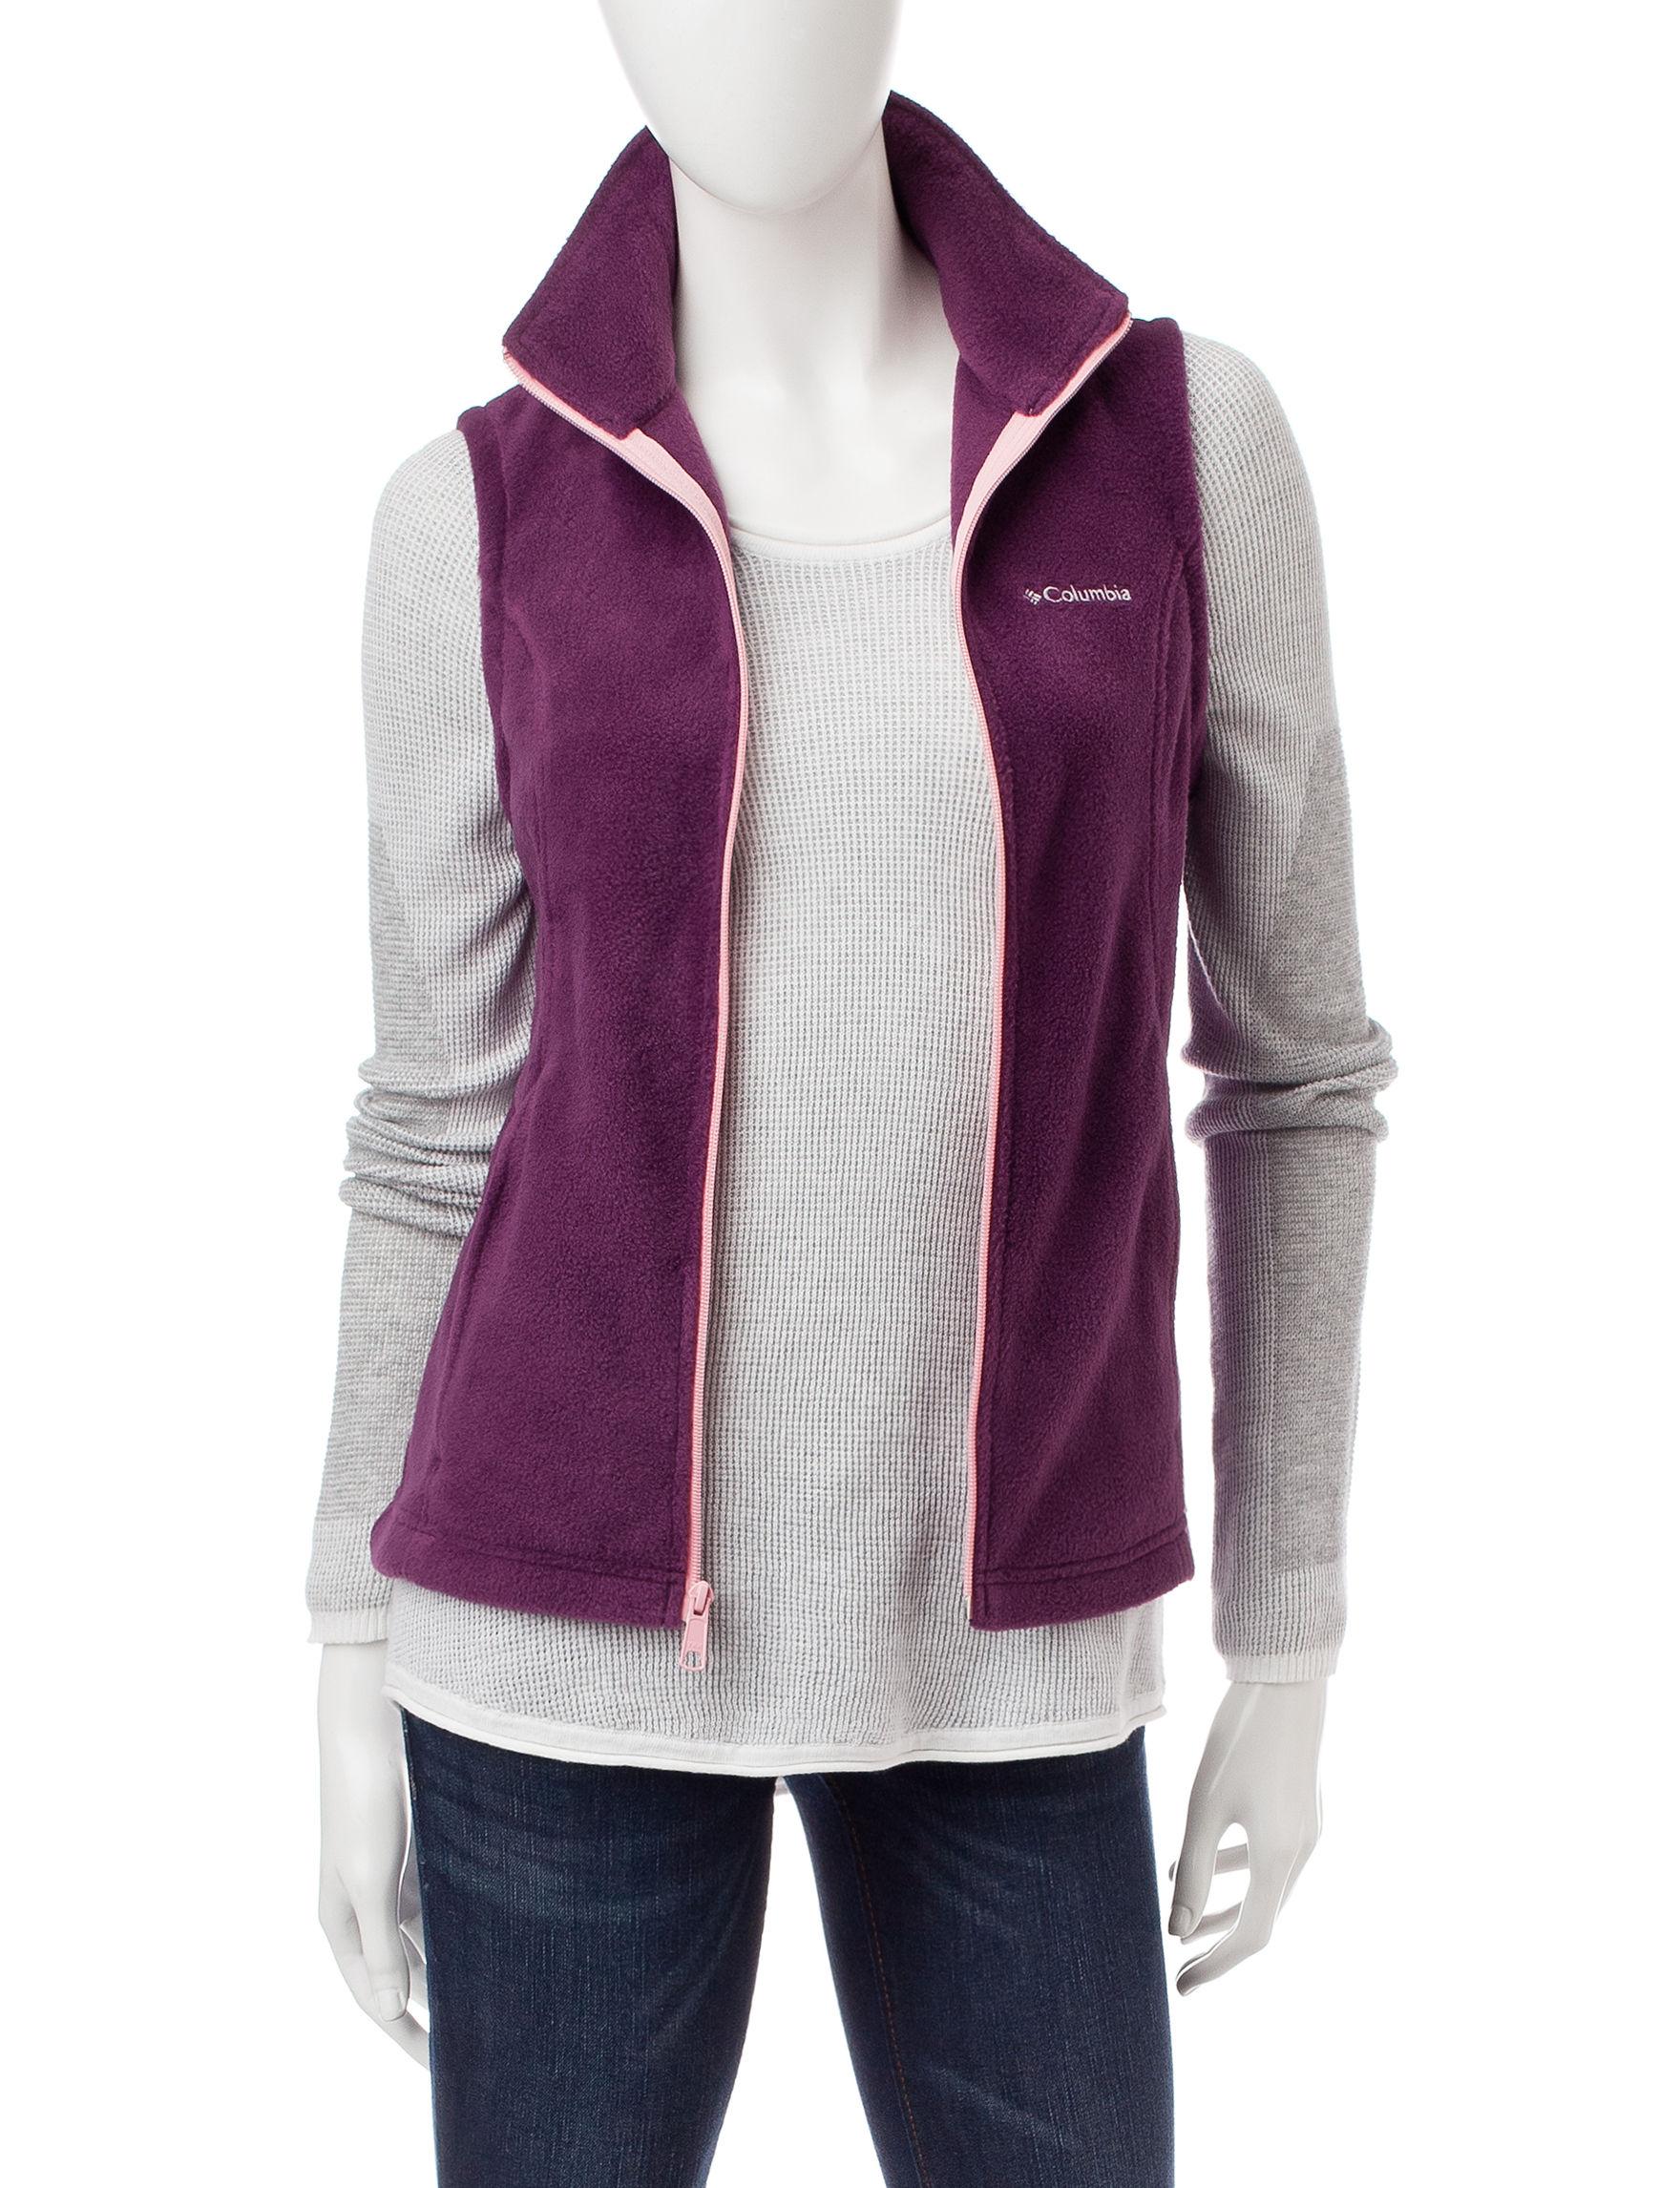 Columbia Purple Fleece & Soft Shell Jackets Lightweight Jackets & Blazers